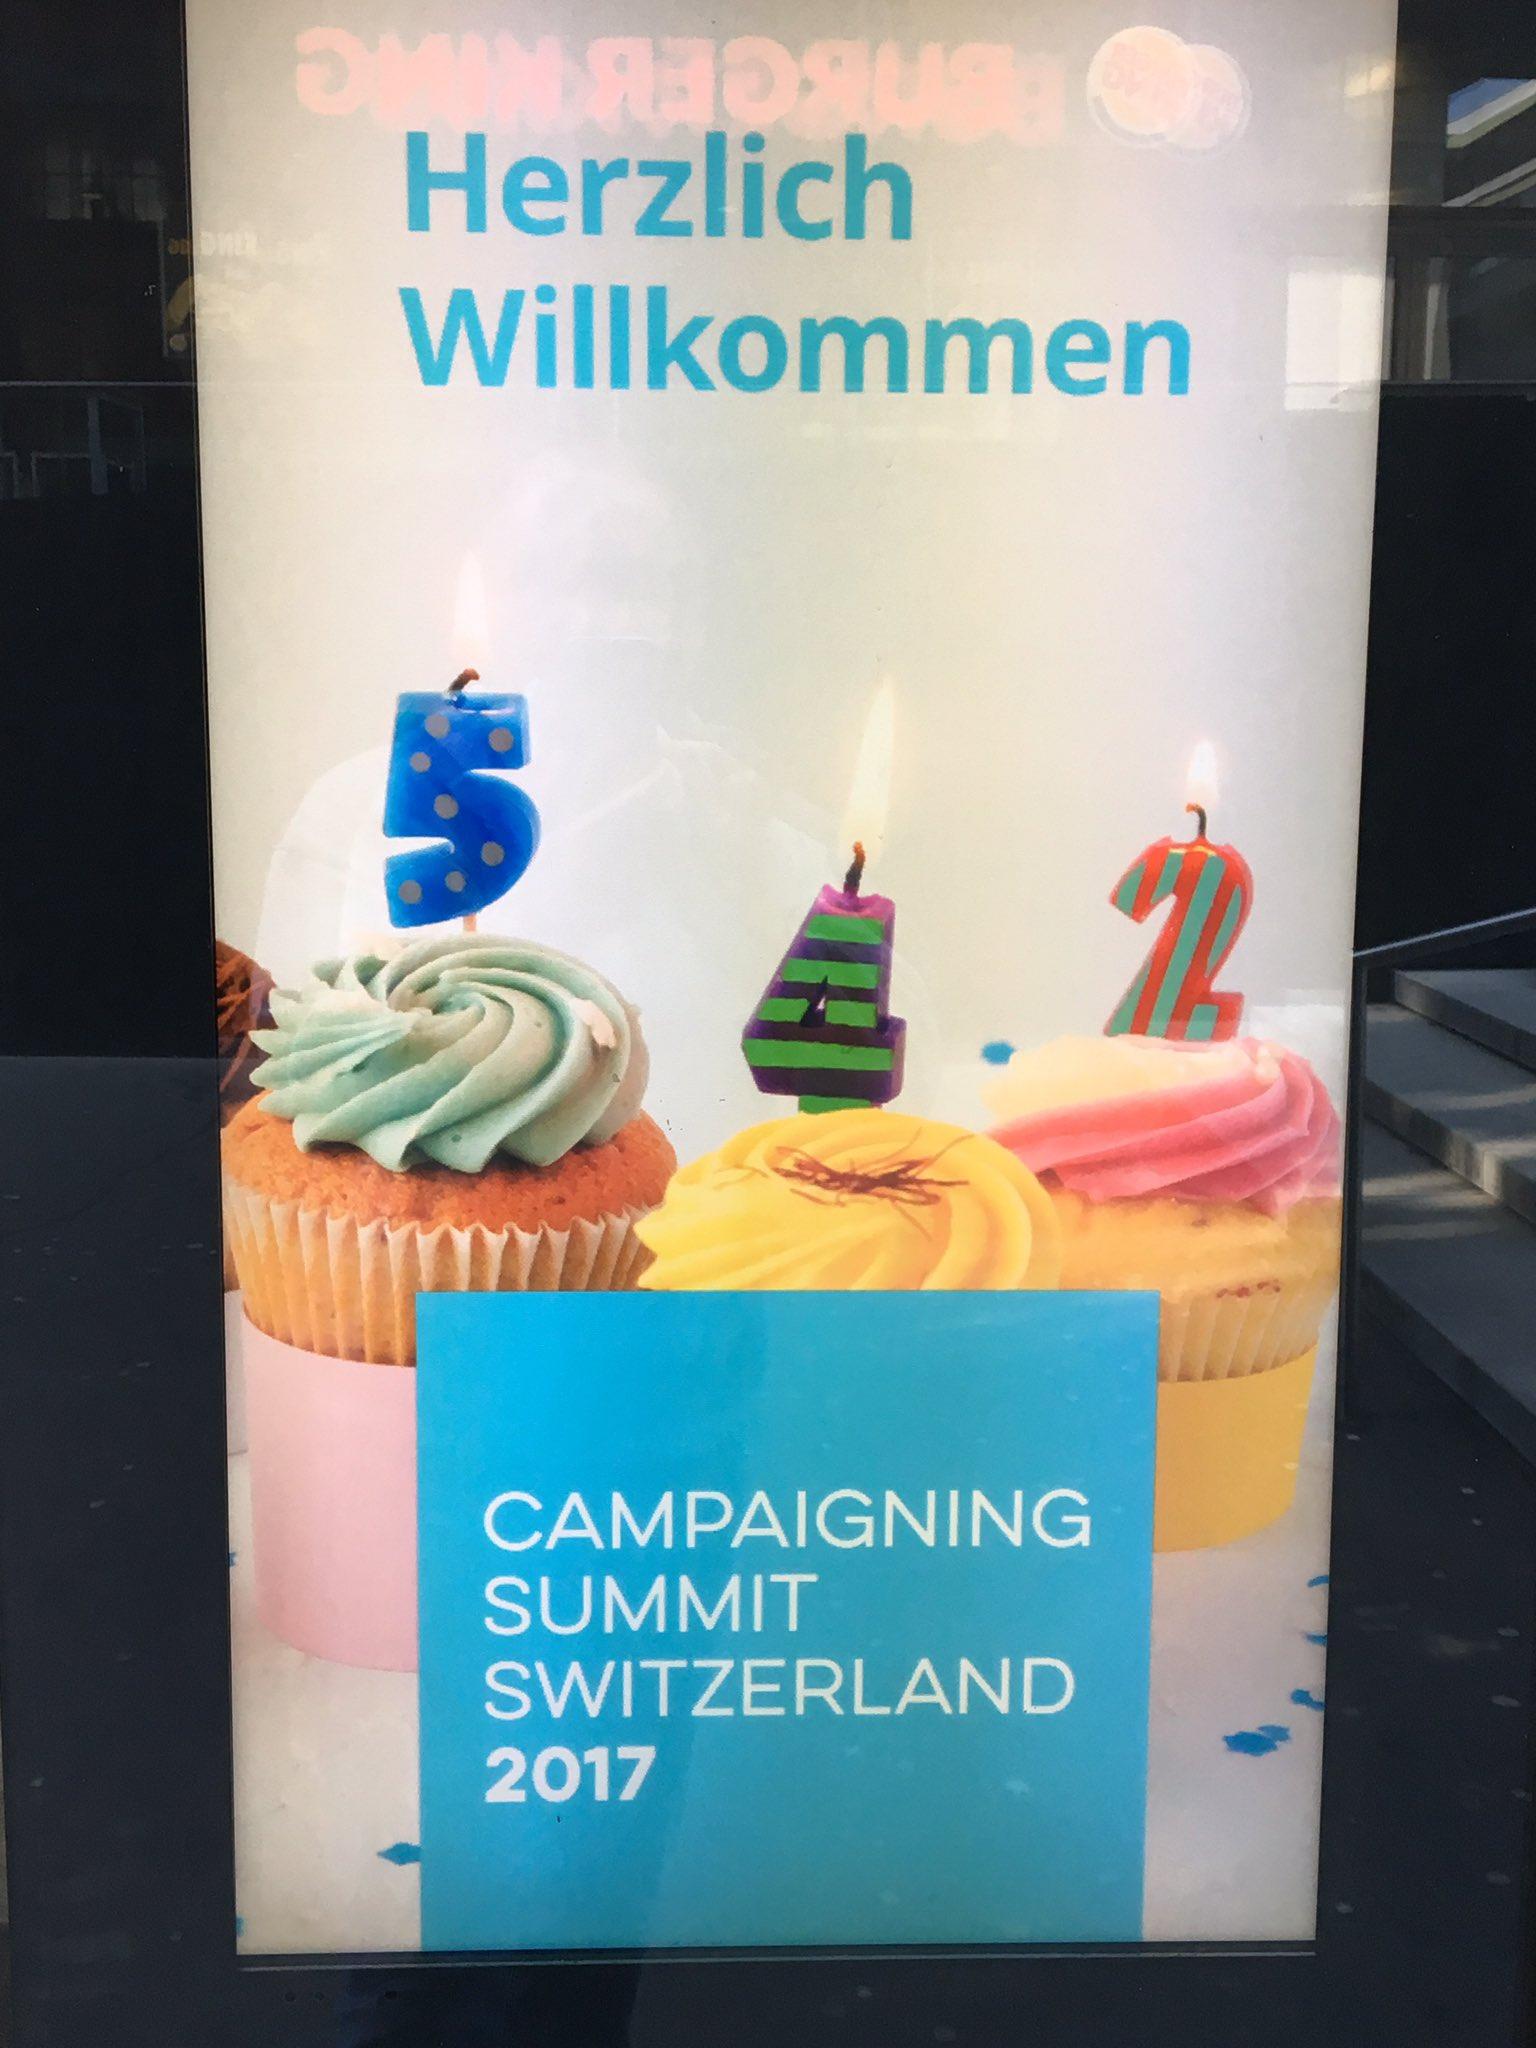 Good to be in #Zurich - #CSCH17 kicks off tomorrow https://t.co/rW4vcyzDvL